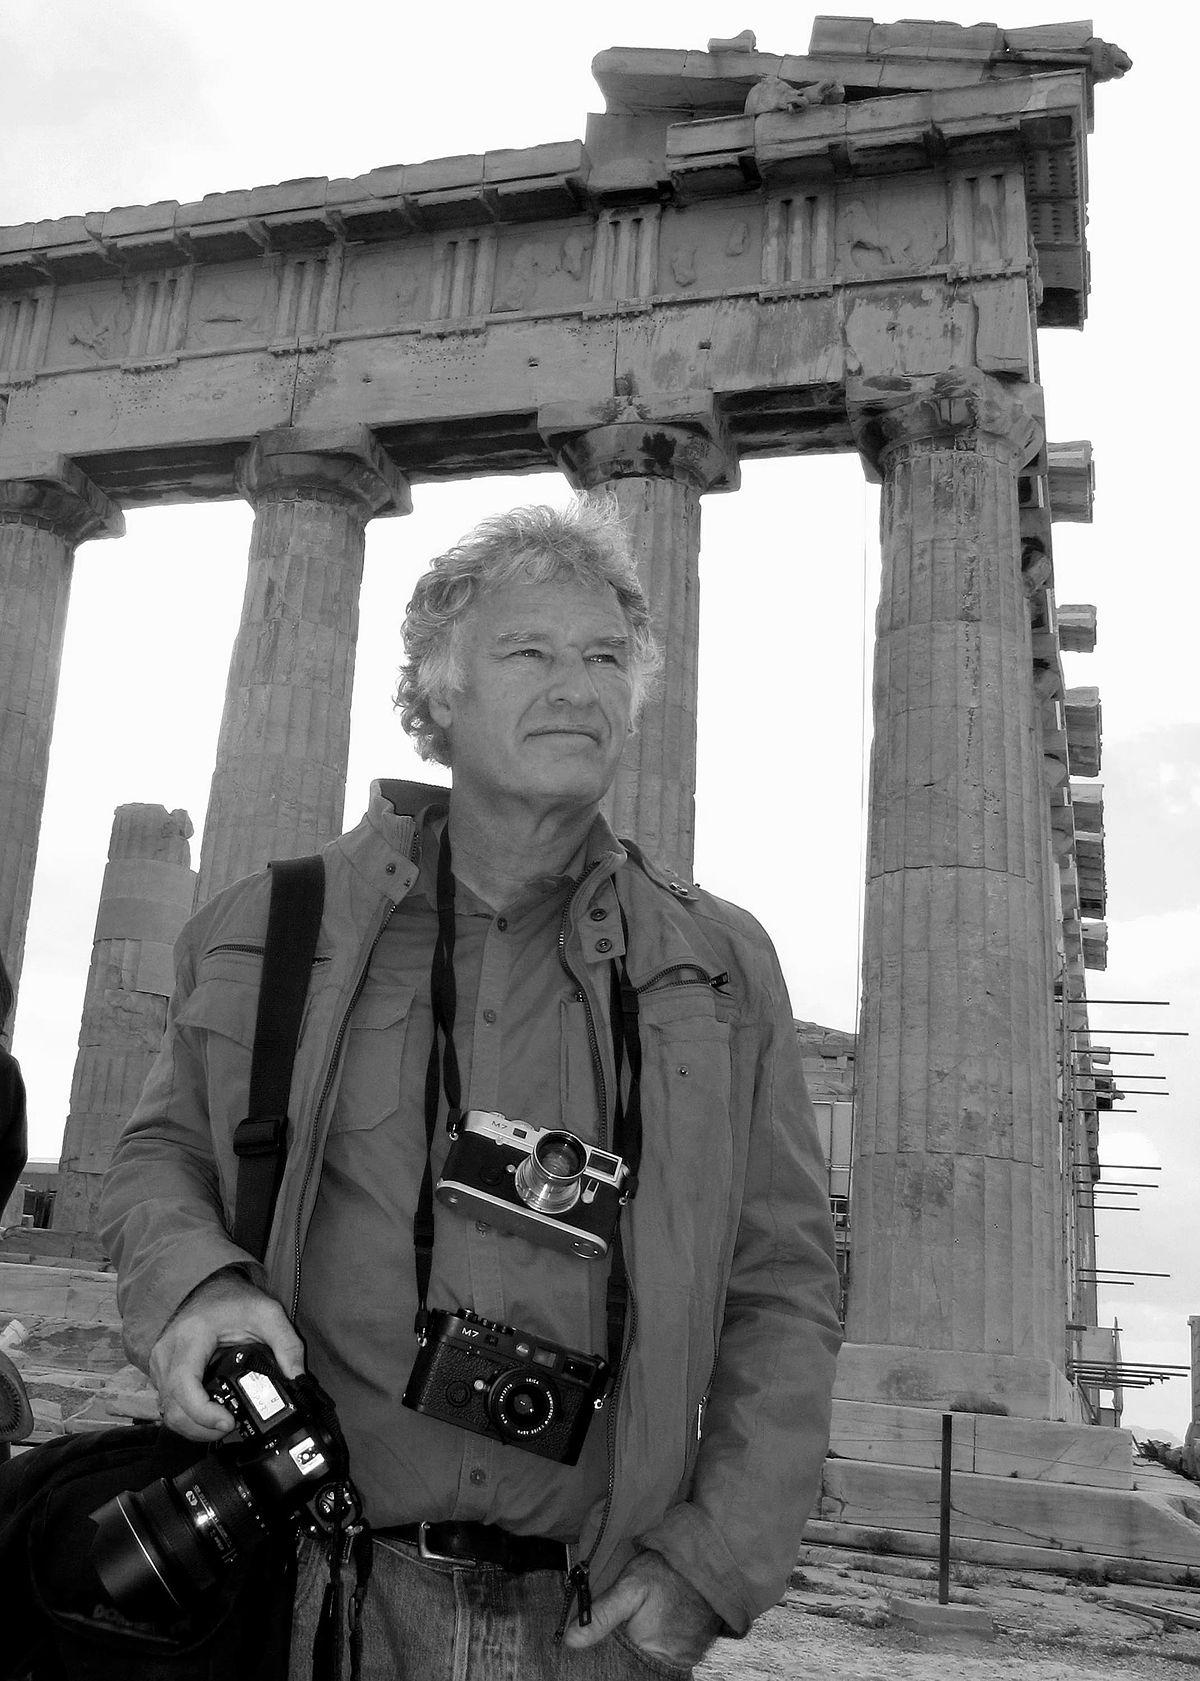 Image of Jeff Widener from Wikidata